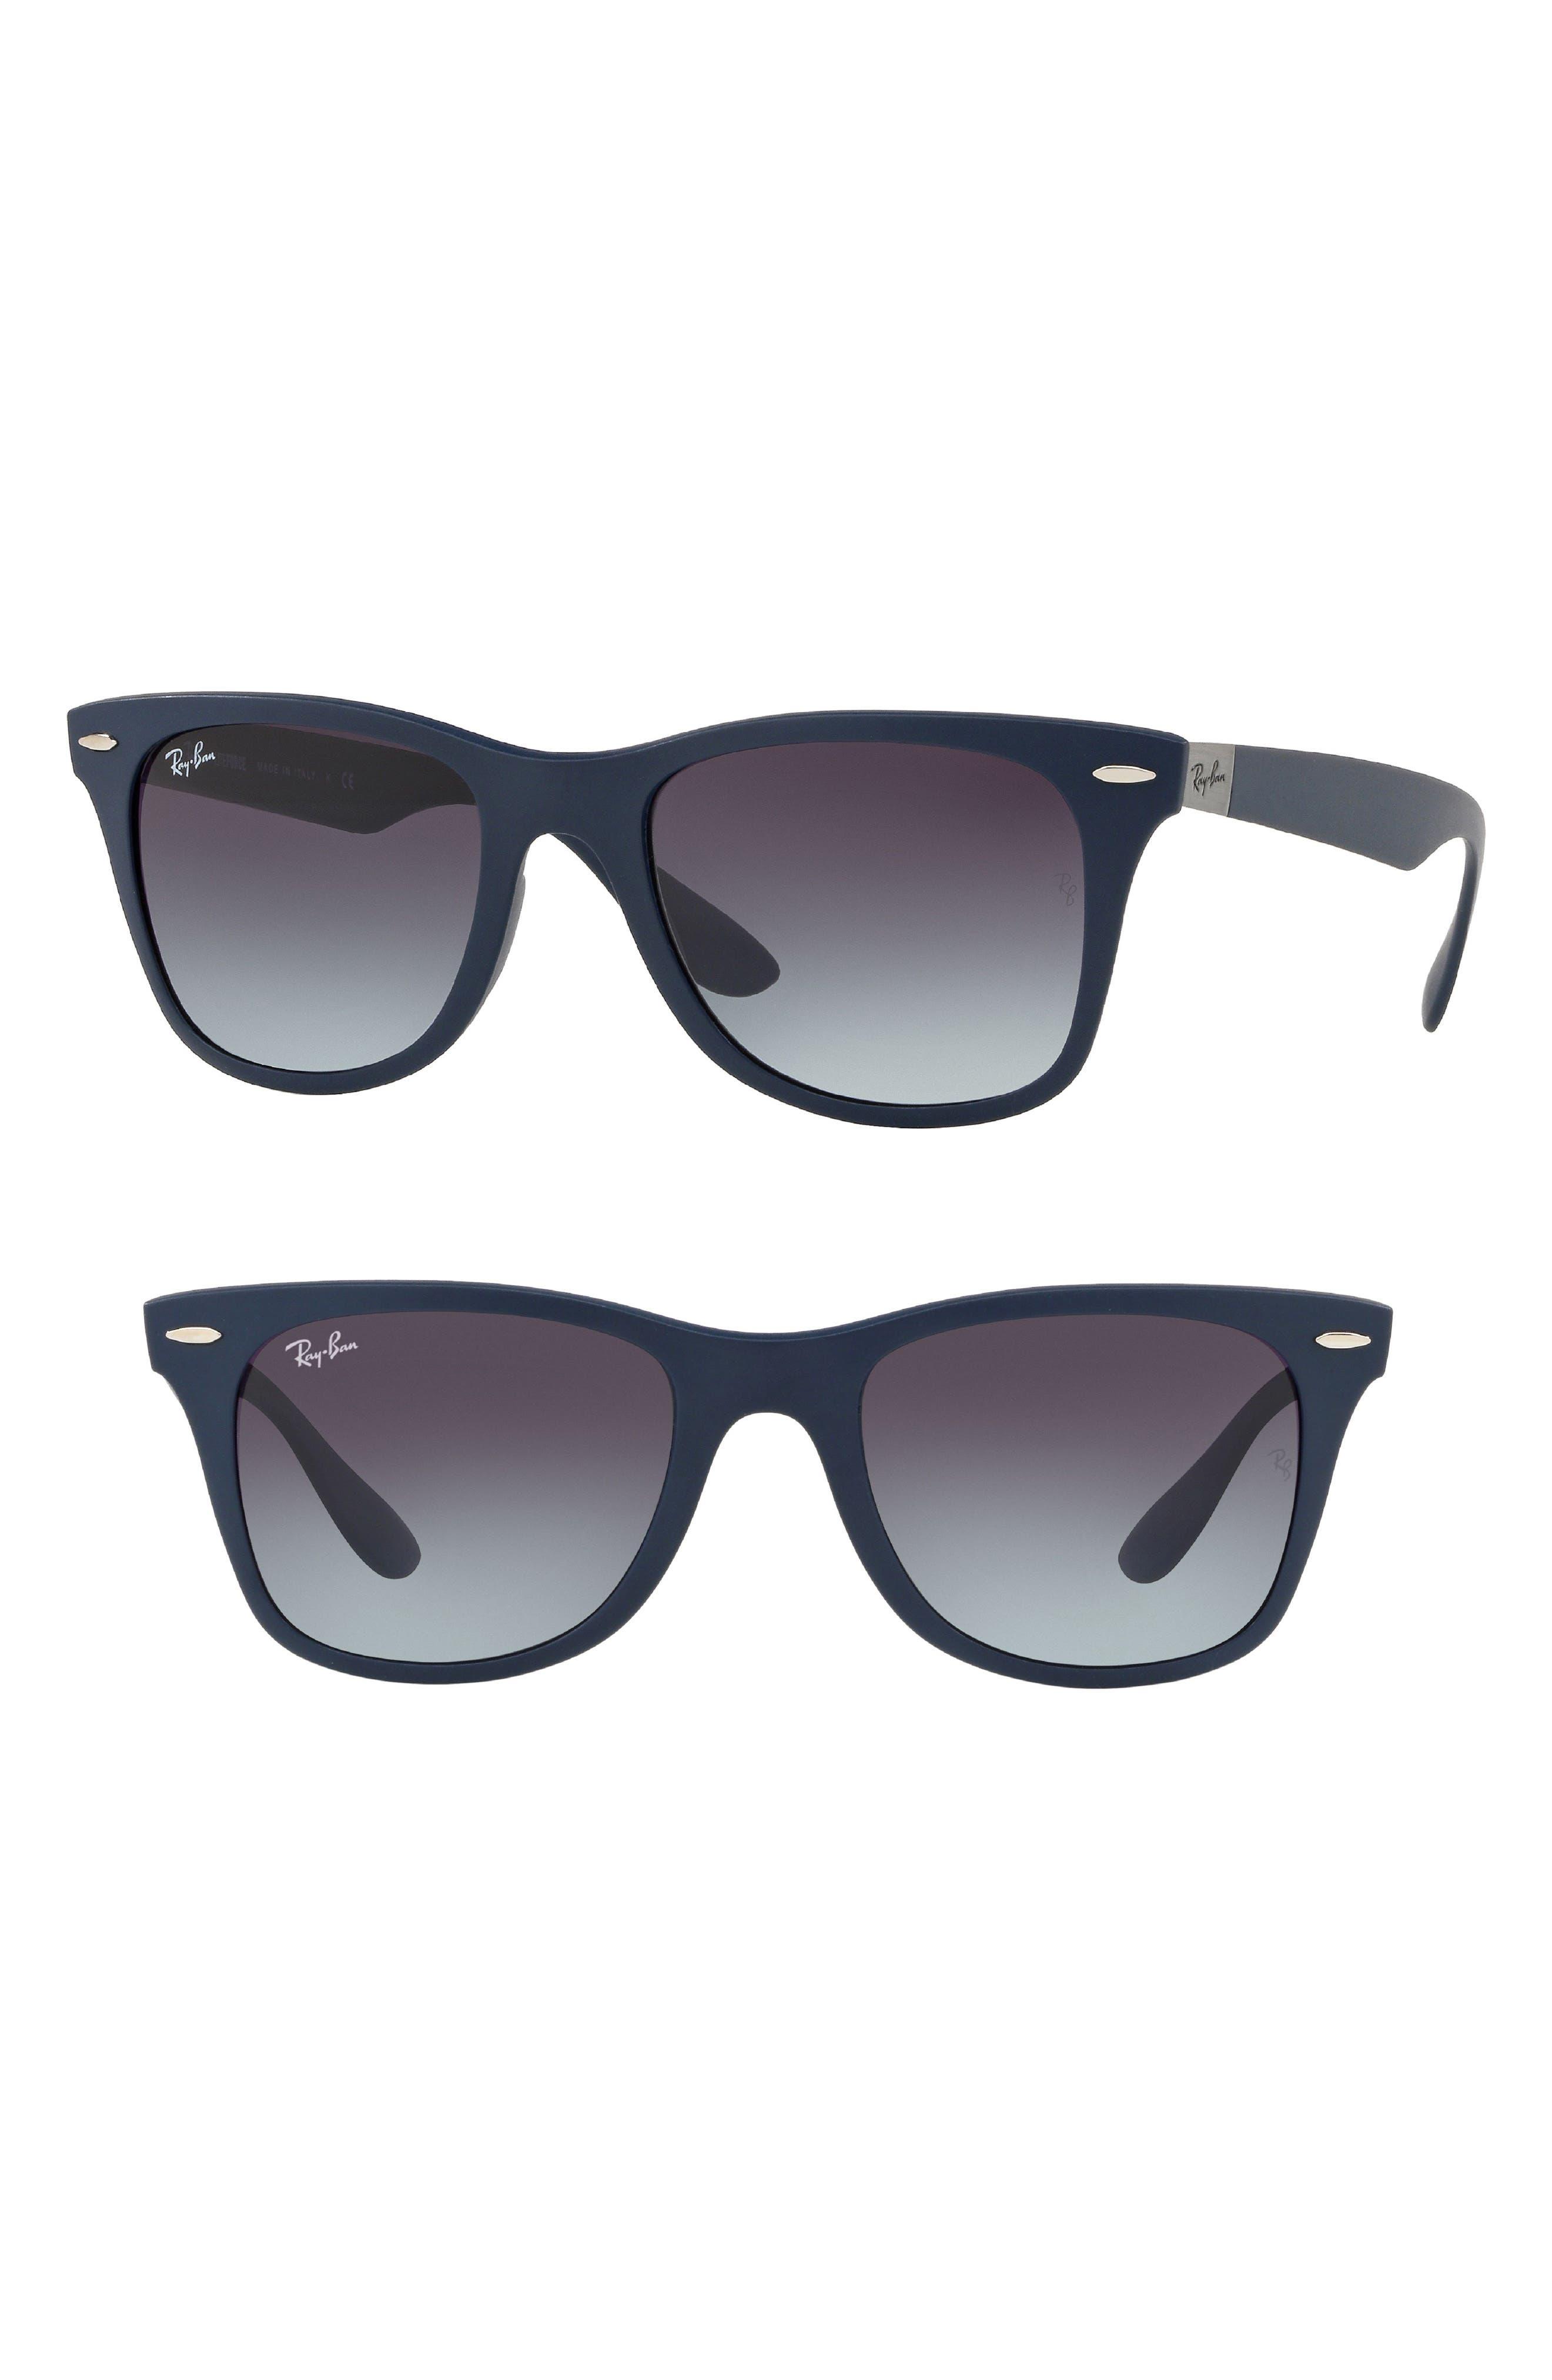 Wayfarer Liteforce 52mm Sunglasses,                             Main thumbnail 1, color,                             Blue Grey